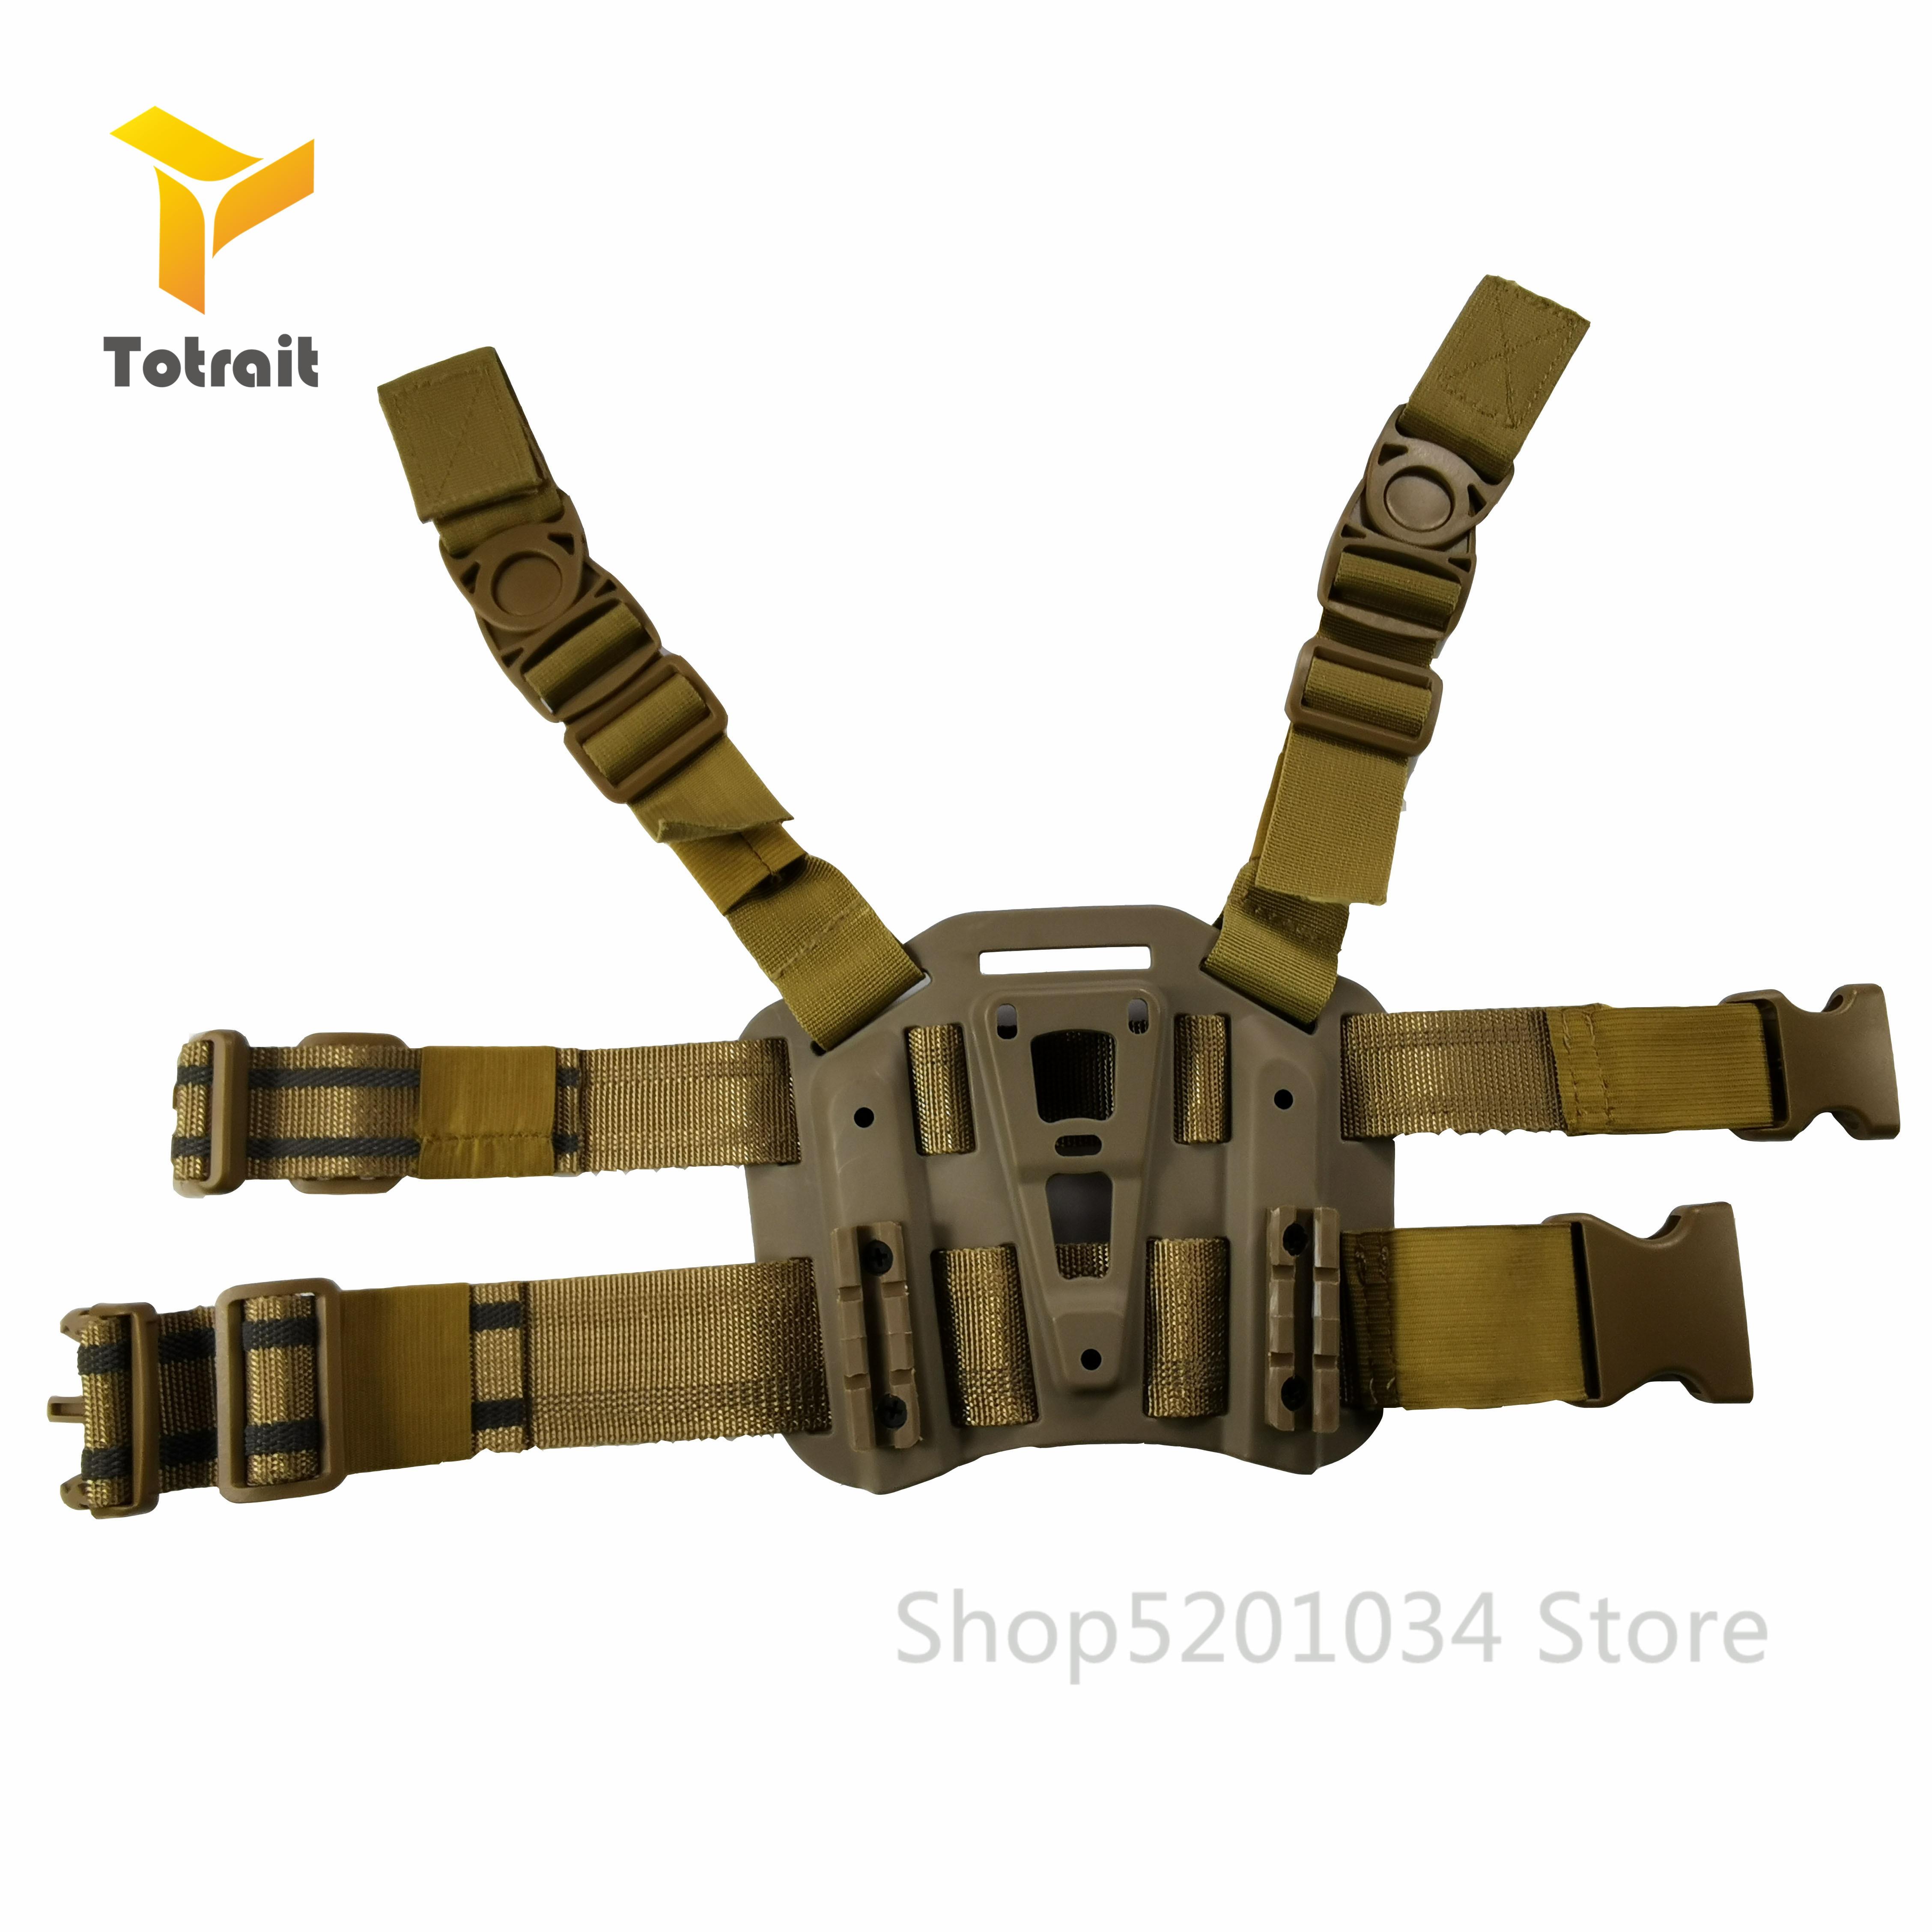 Pistola militar accesorios pierna pistolera plataforma Paddle para glock 17 HK USP P226 Compact Beratta M9 Arisoft tiro muslo pistolera